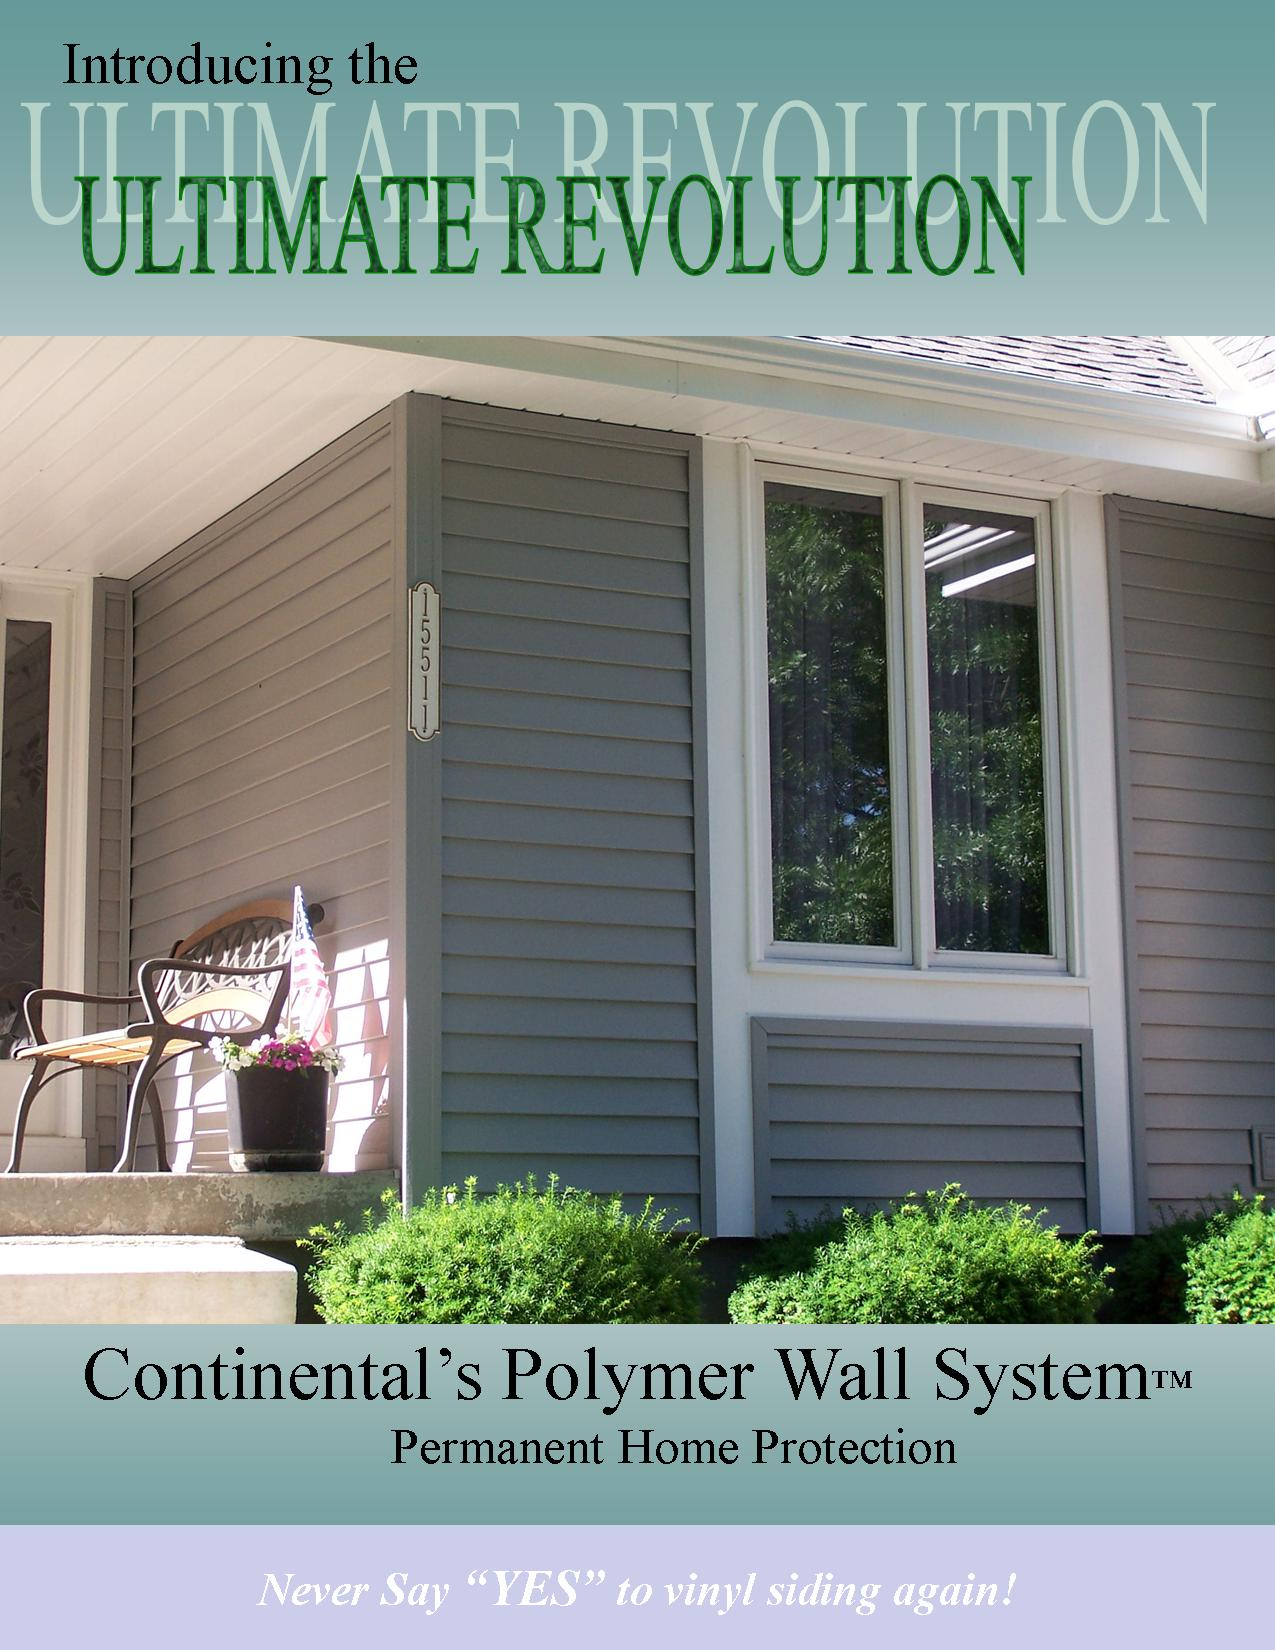 seamless, polymer, PolymerWall System